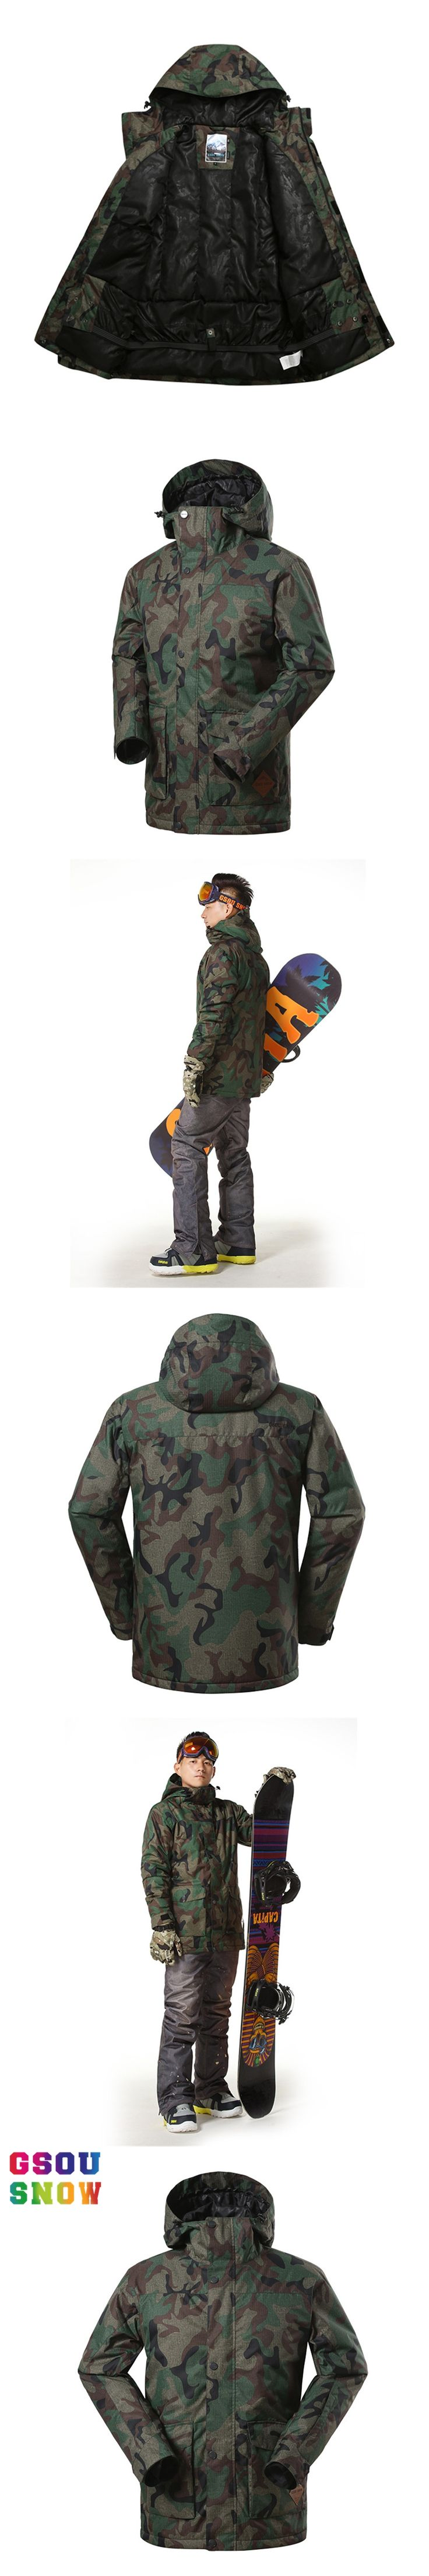 GSOU SNOW Ski Jacket Men Camouflage Thicken Snowboard Jacket Men Warmth Breathable Waterproof Outdoor Sports Winter Snow Coats